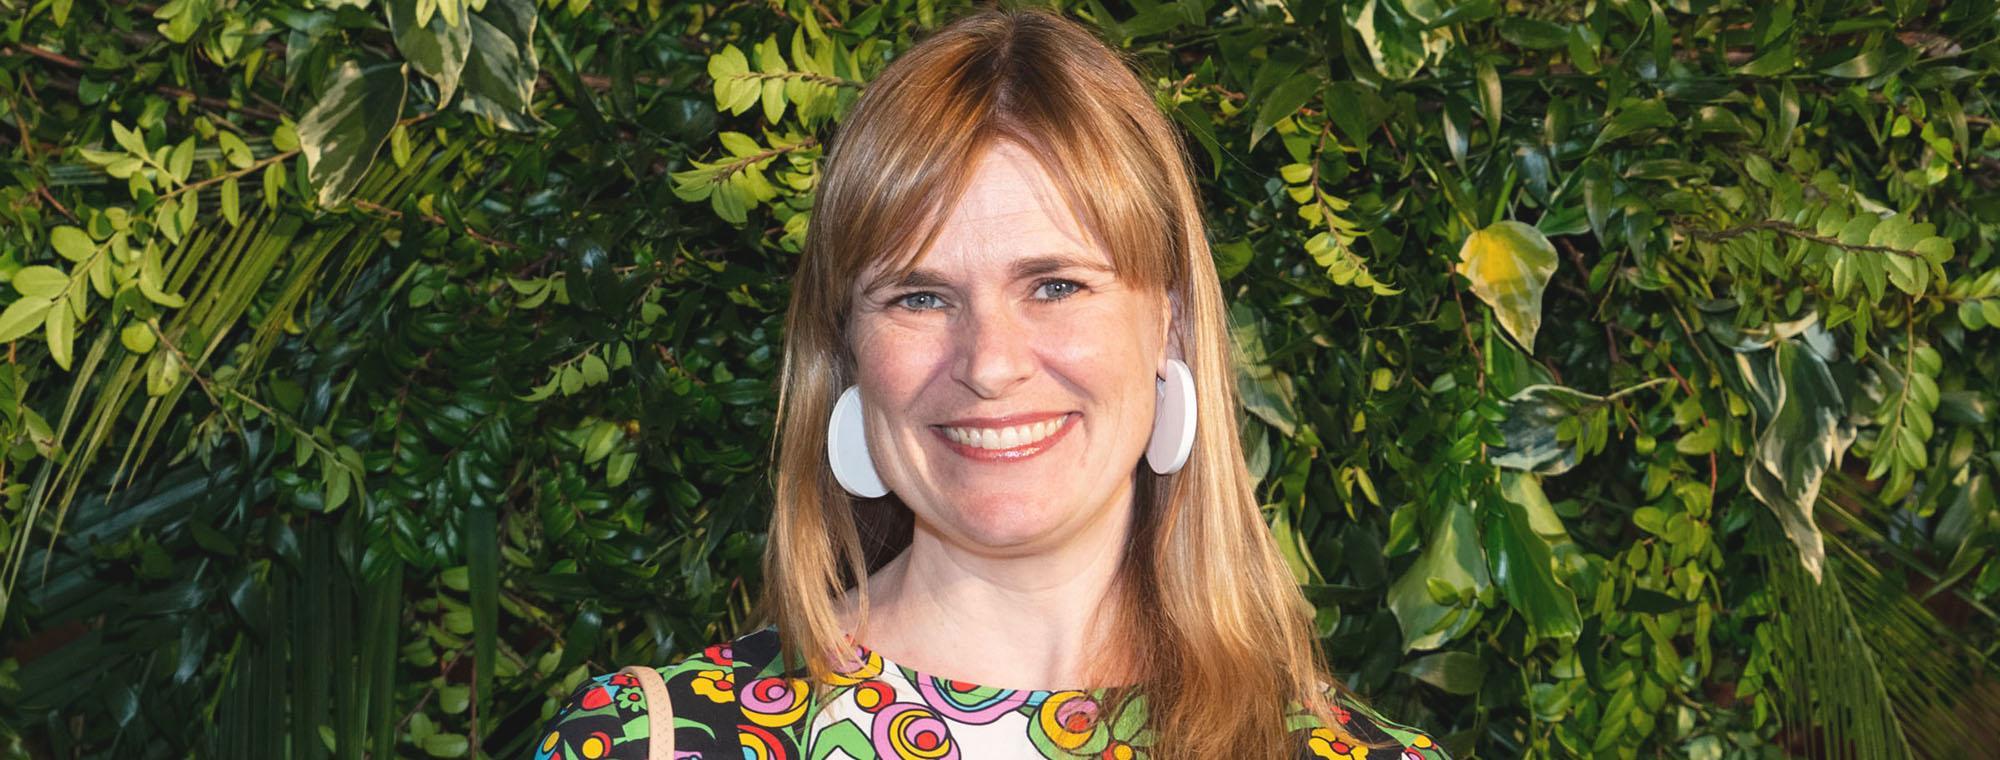 Emma Belcher